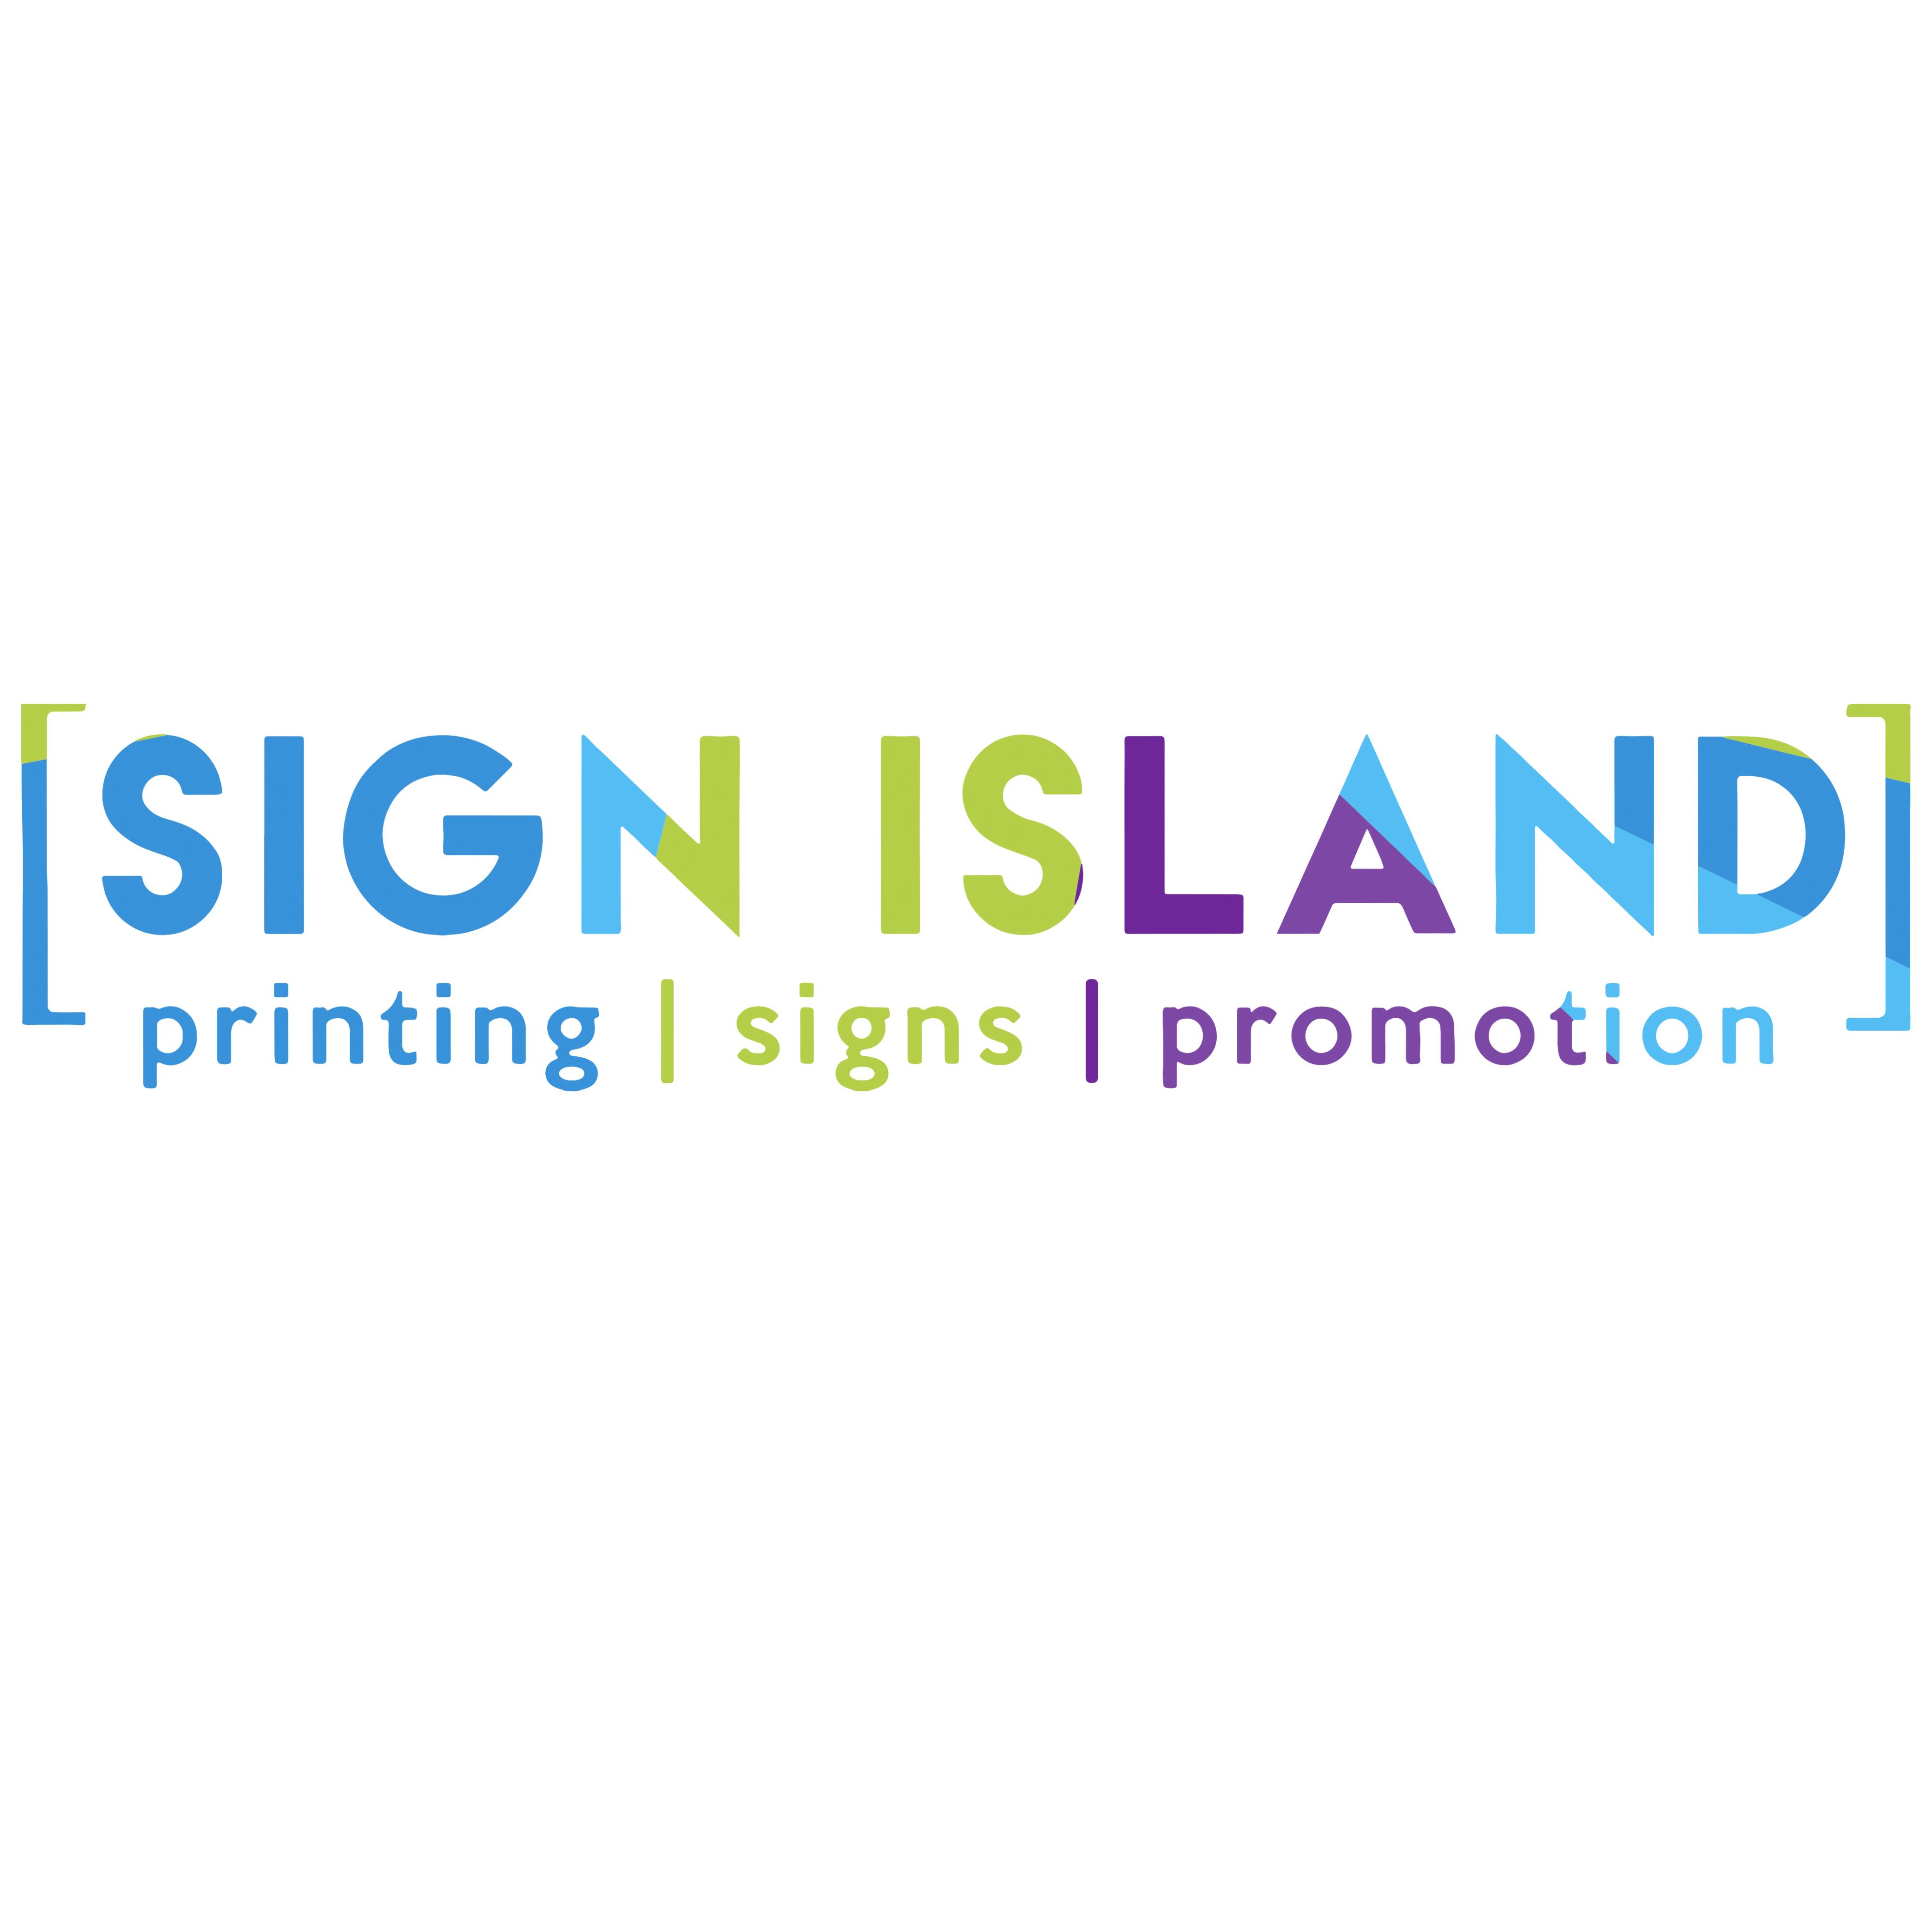 Sign Island